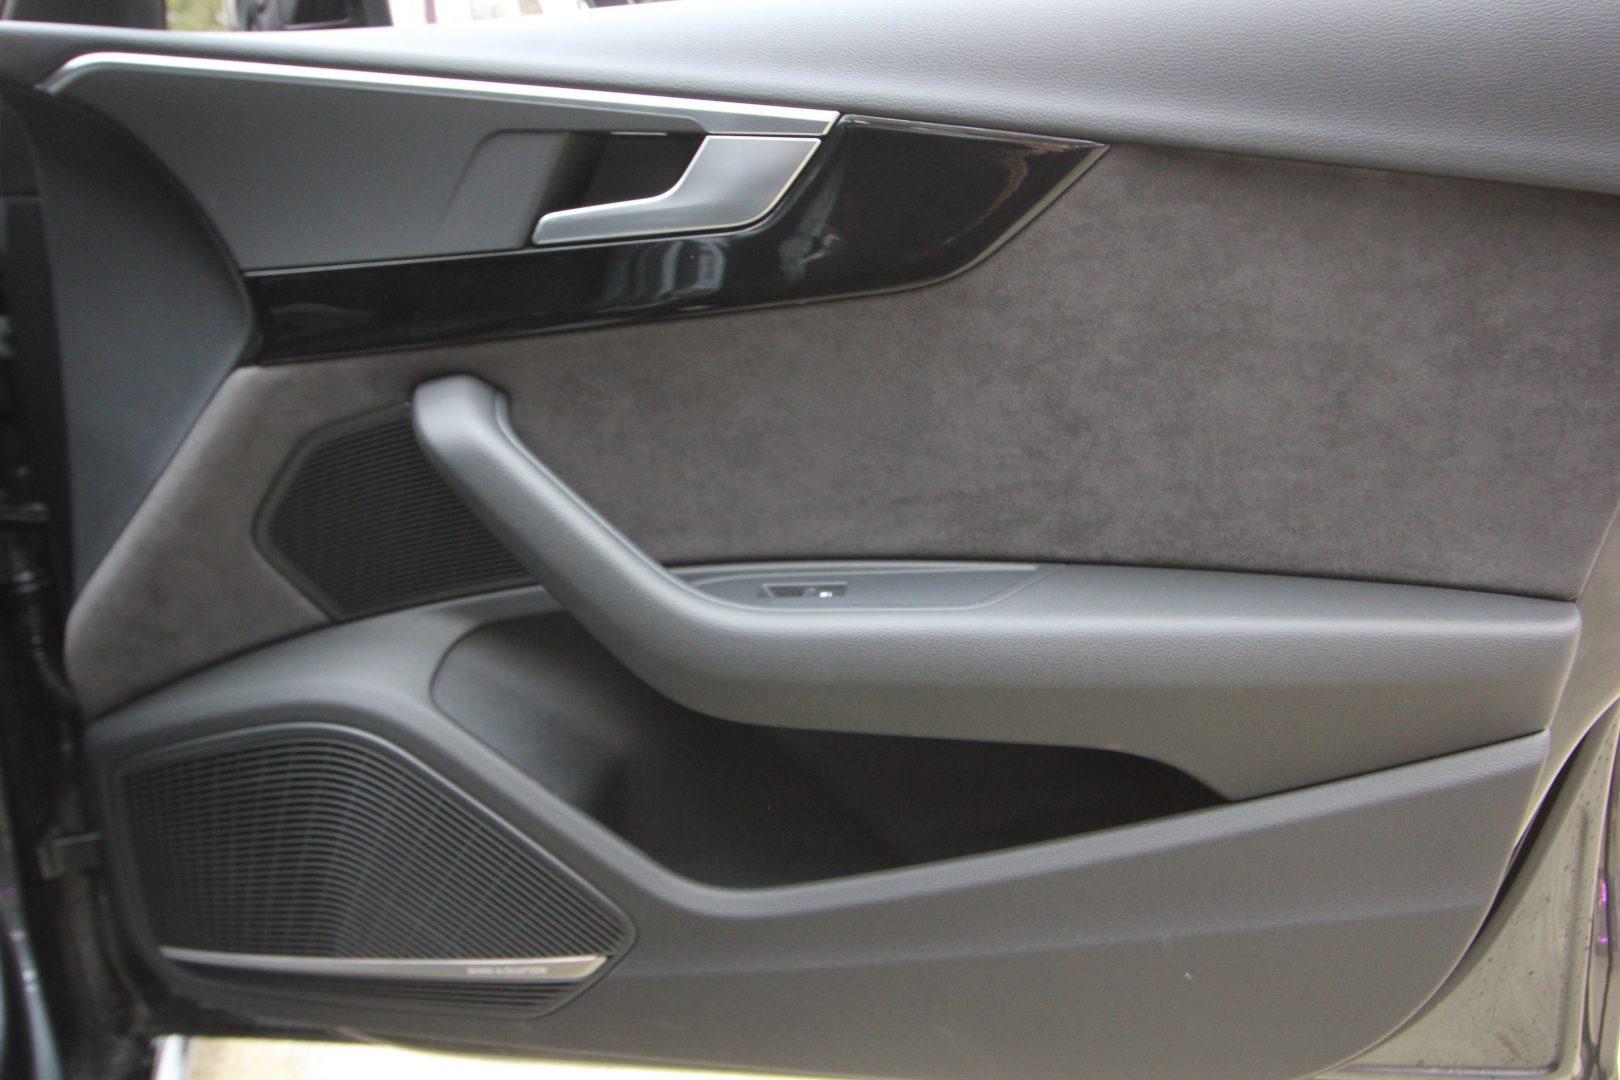 AIL Audi A4 Avant S line Sport / Plus quattro 3.0 TDI 2